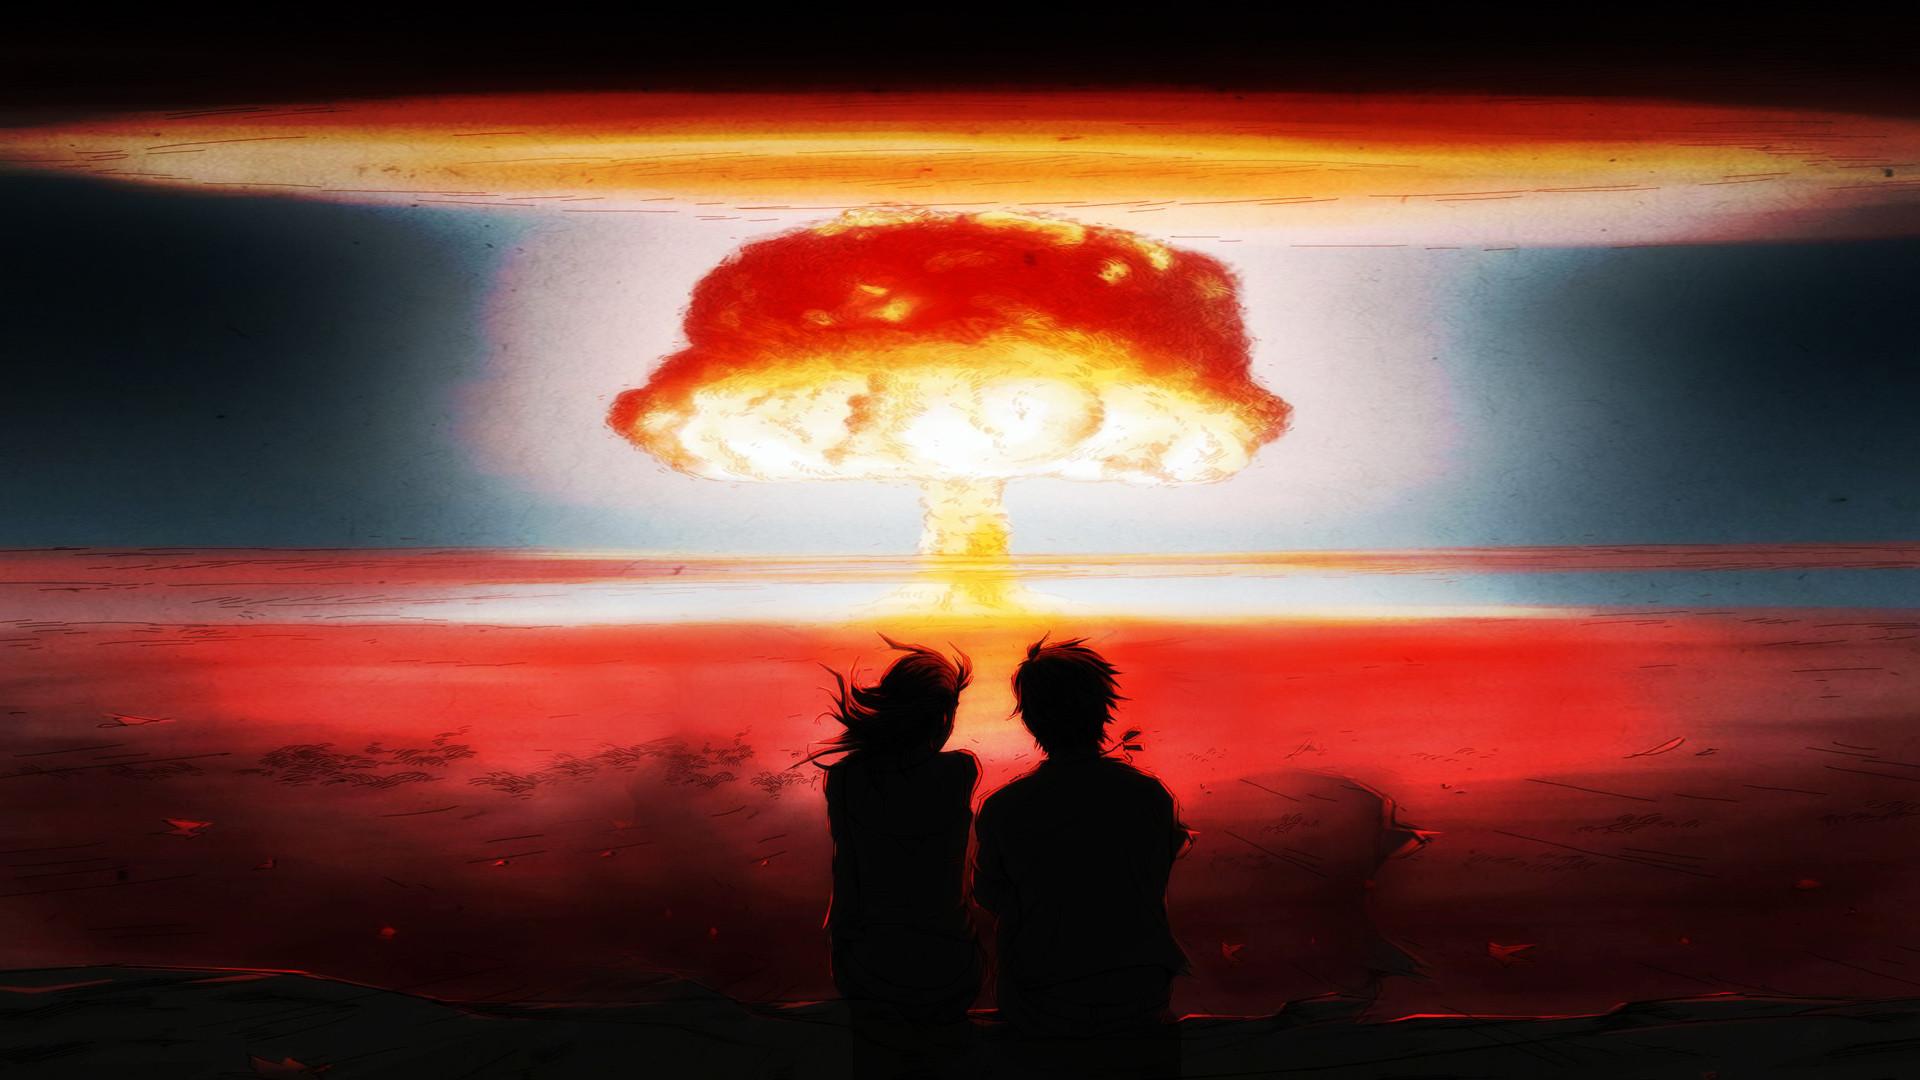 nuke explosion wallpaper (64+ images)